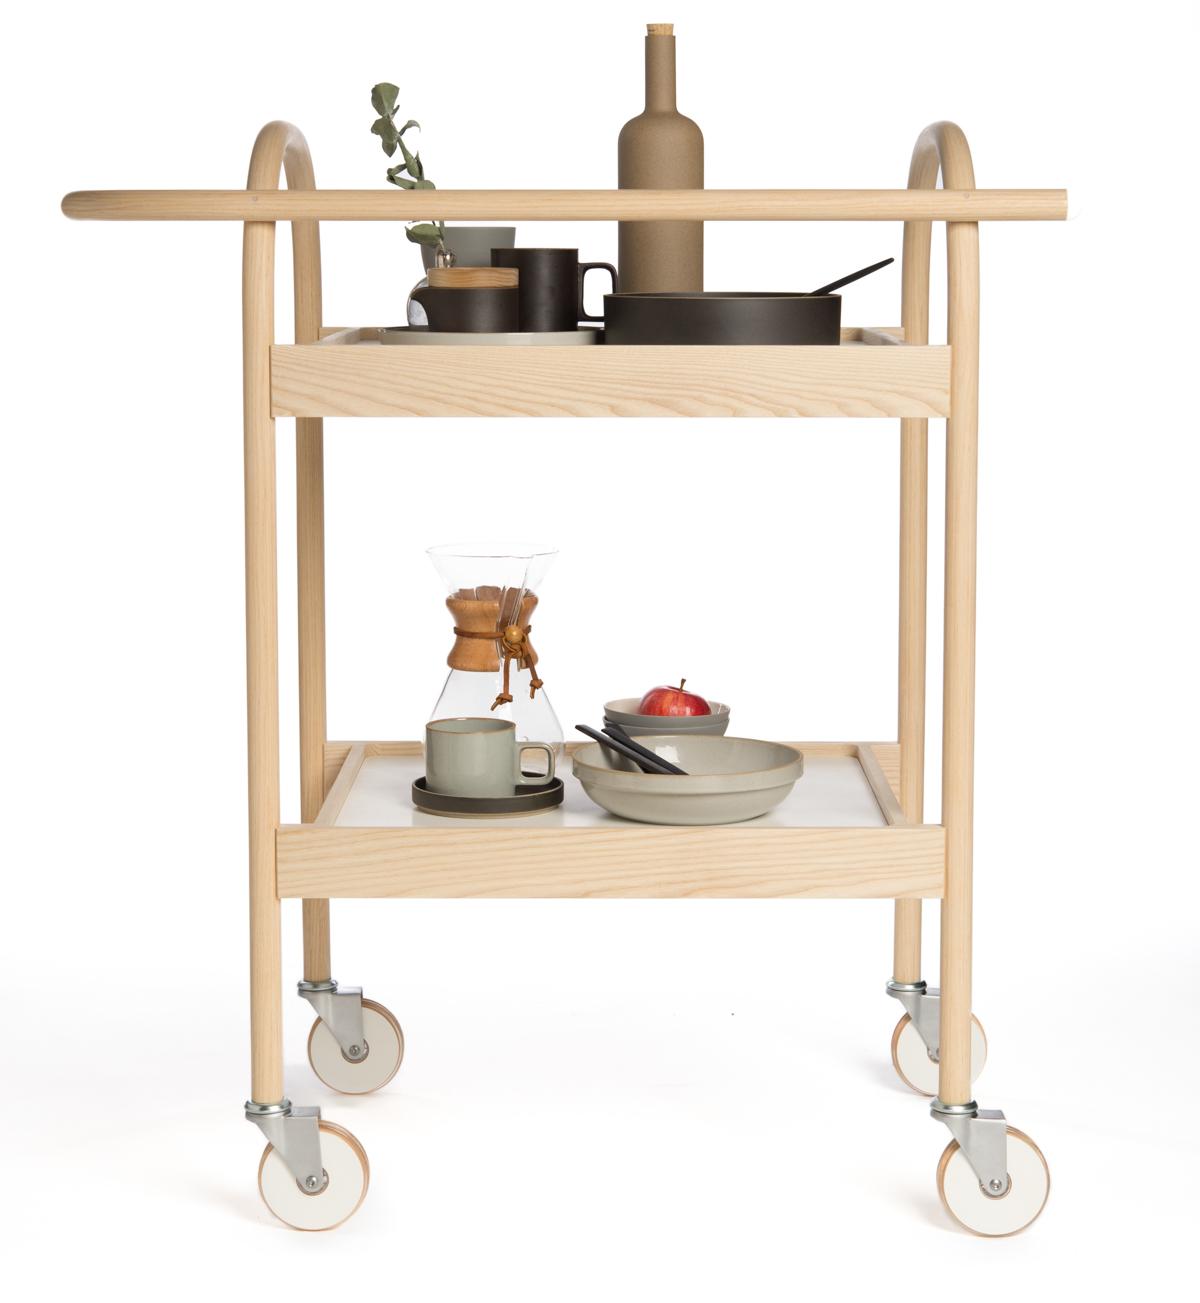 Minimalist Furniture by Bowen Liu